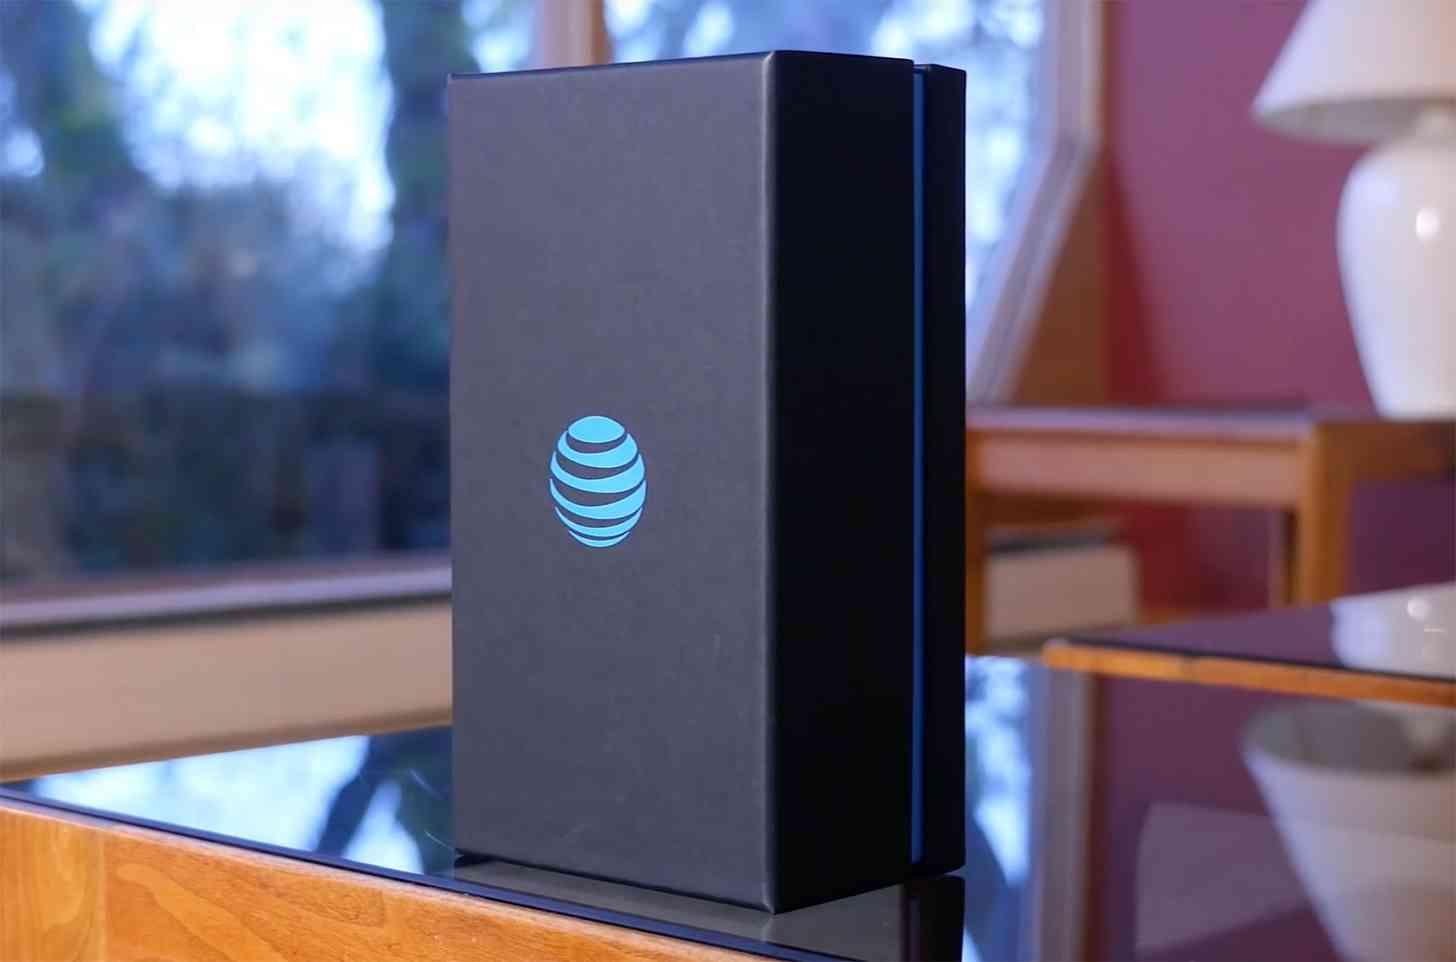 AT&T globe logo packaging